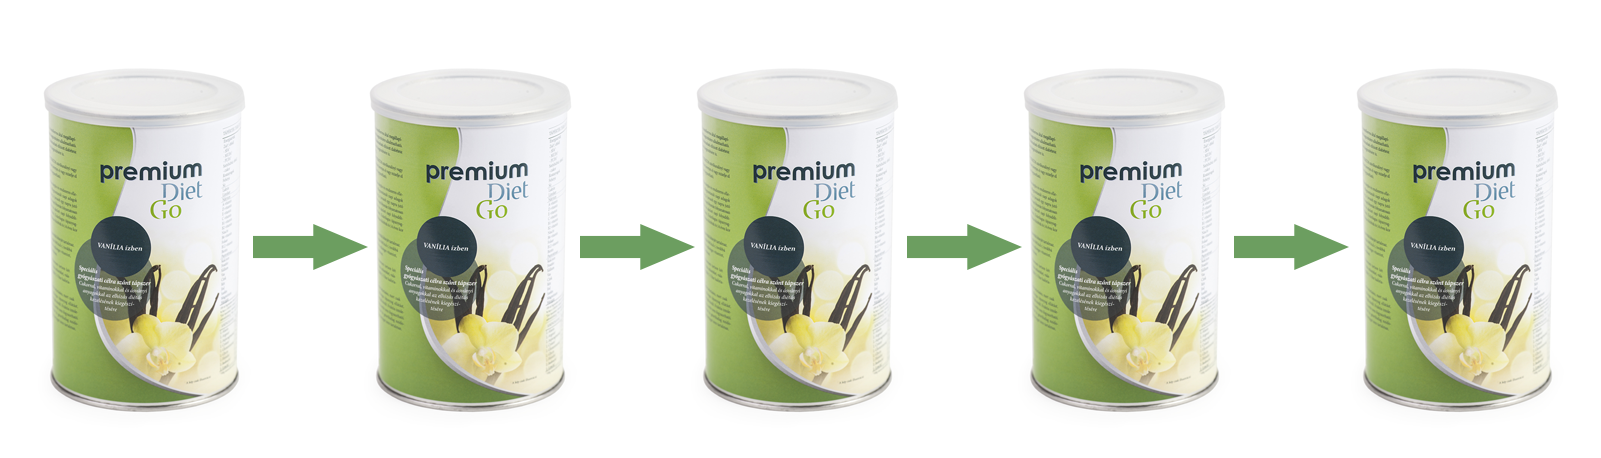 Premium Diet - Alkalmazkodási fázis - Premium Diet Go - jopatikus.hu